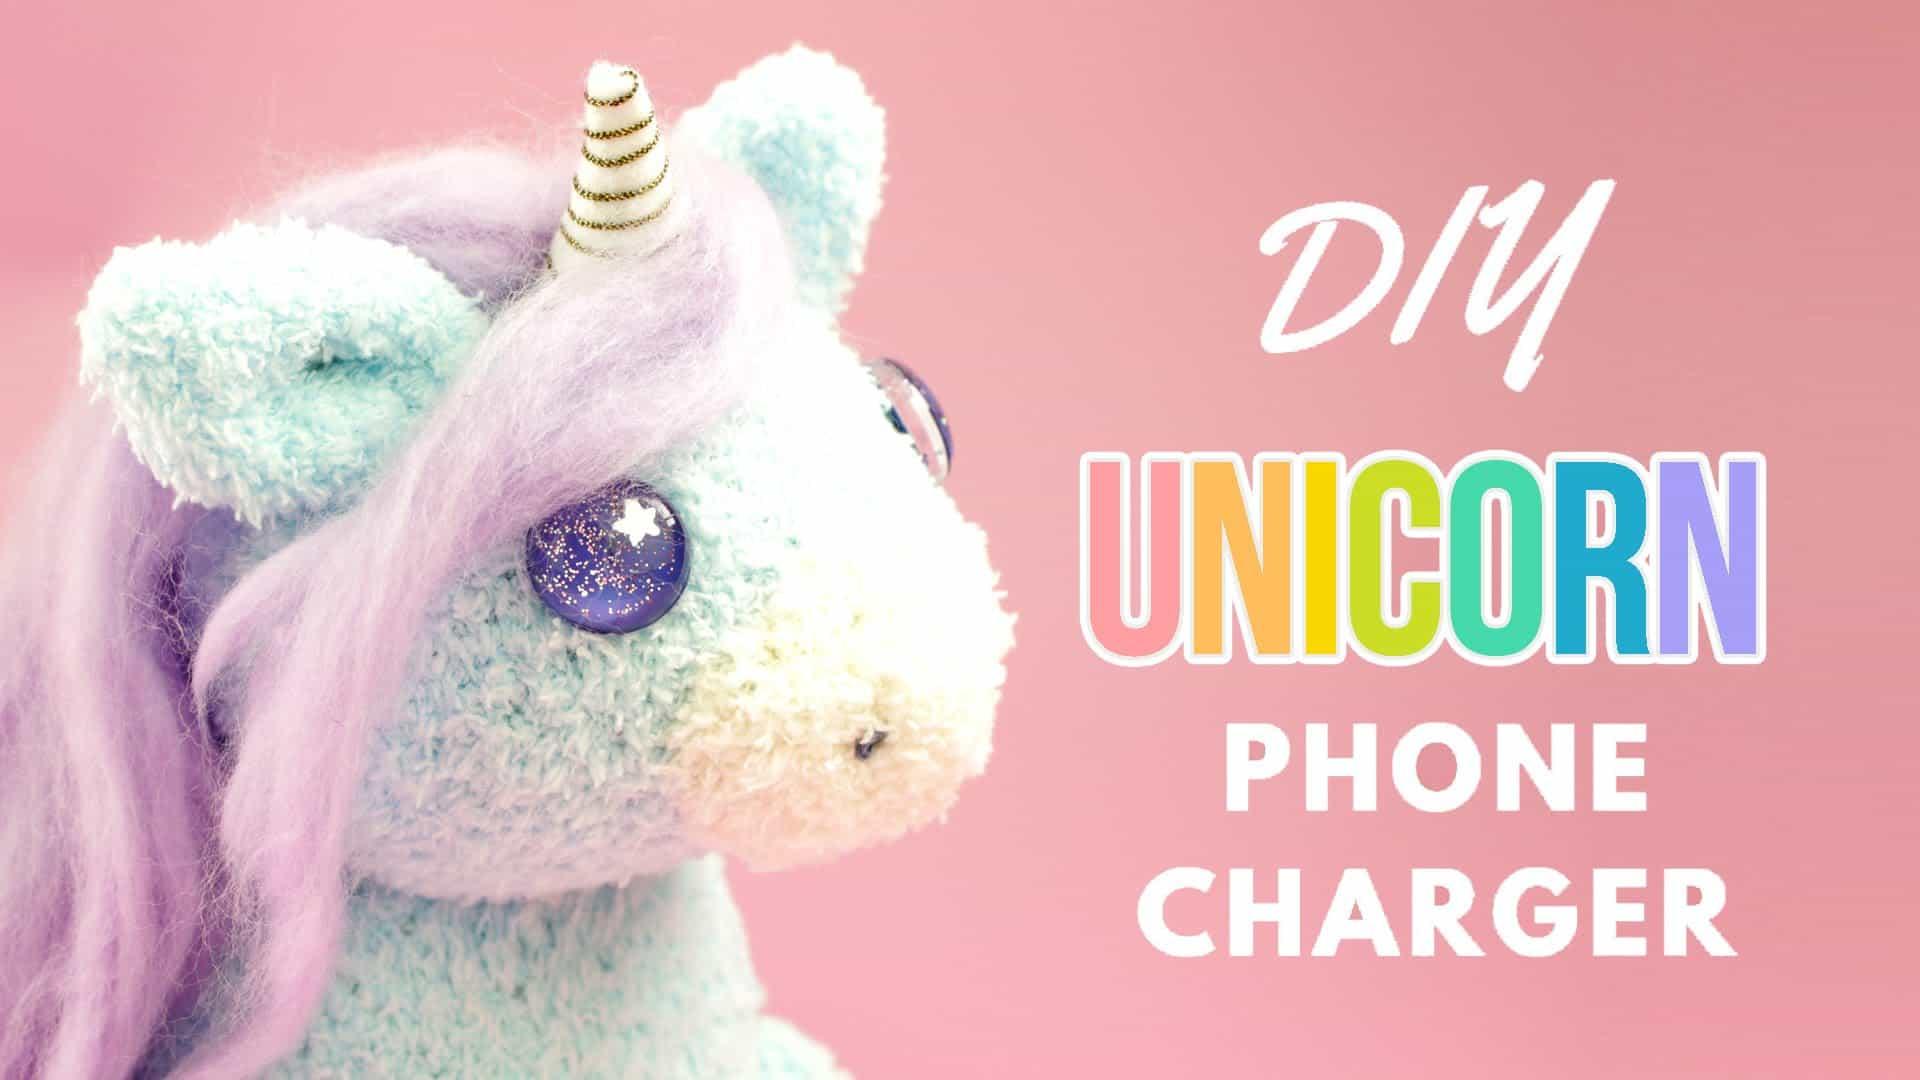 Unicorn phone charger